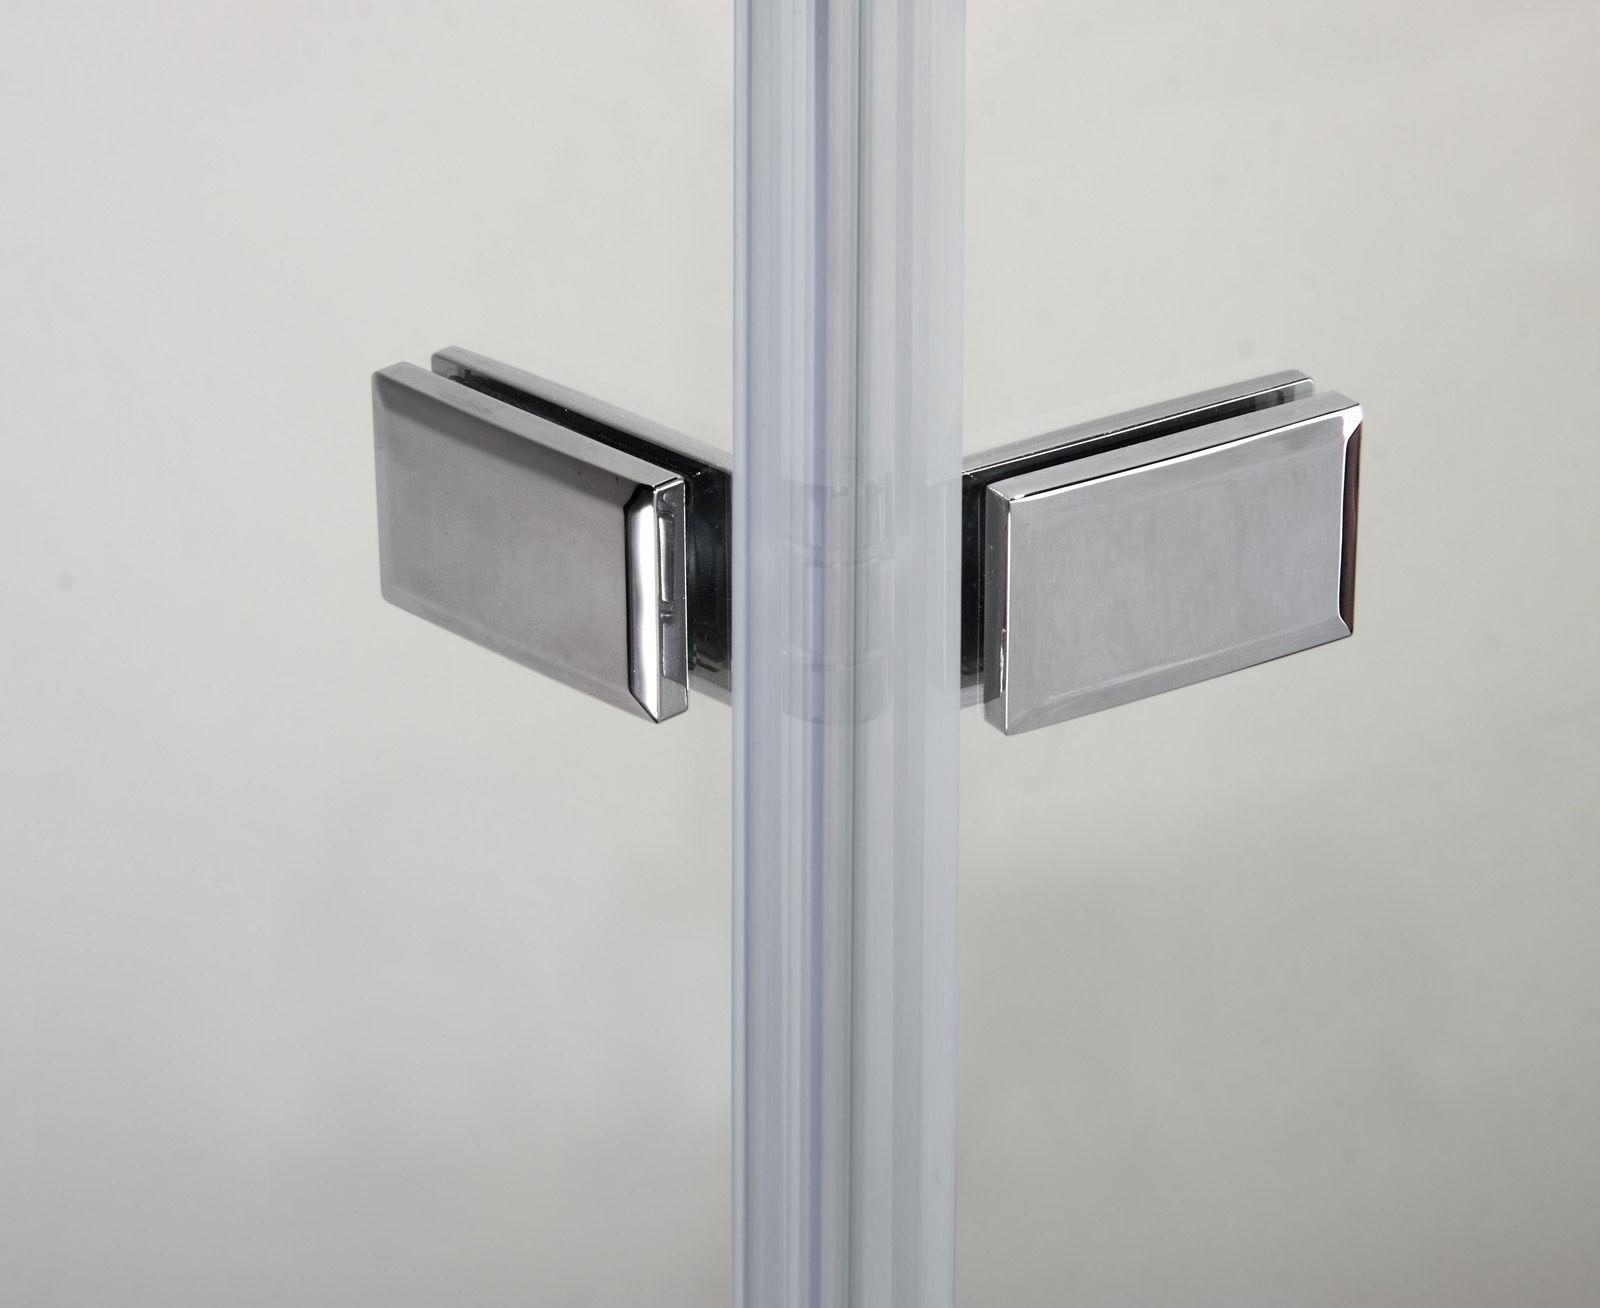 100x140cm pare baignoire 2 volets rabattables 5mm verre. Black Bedroom Furniture Sets. Home Design Ideas